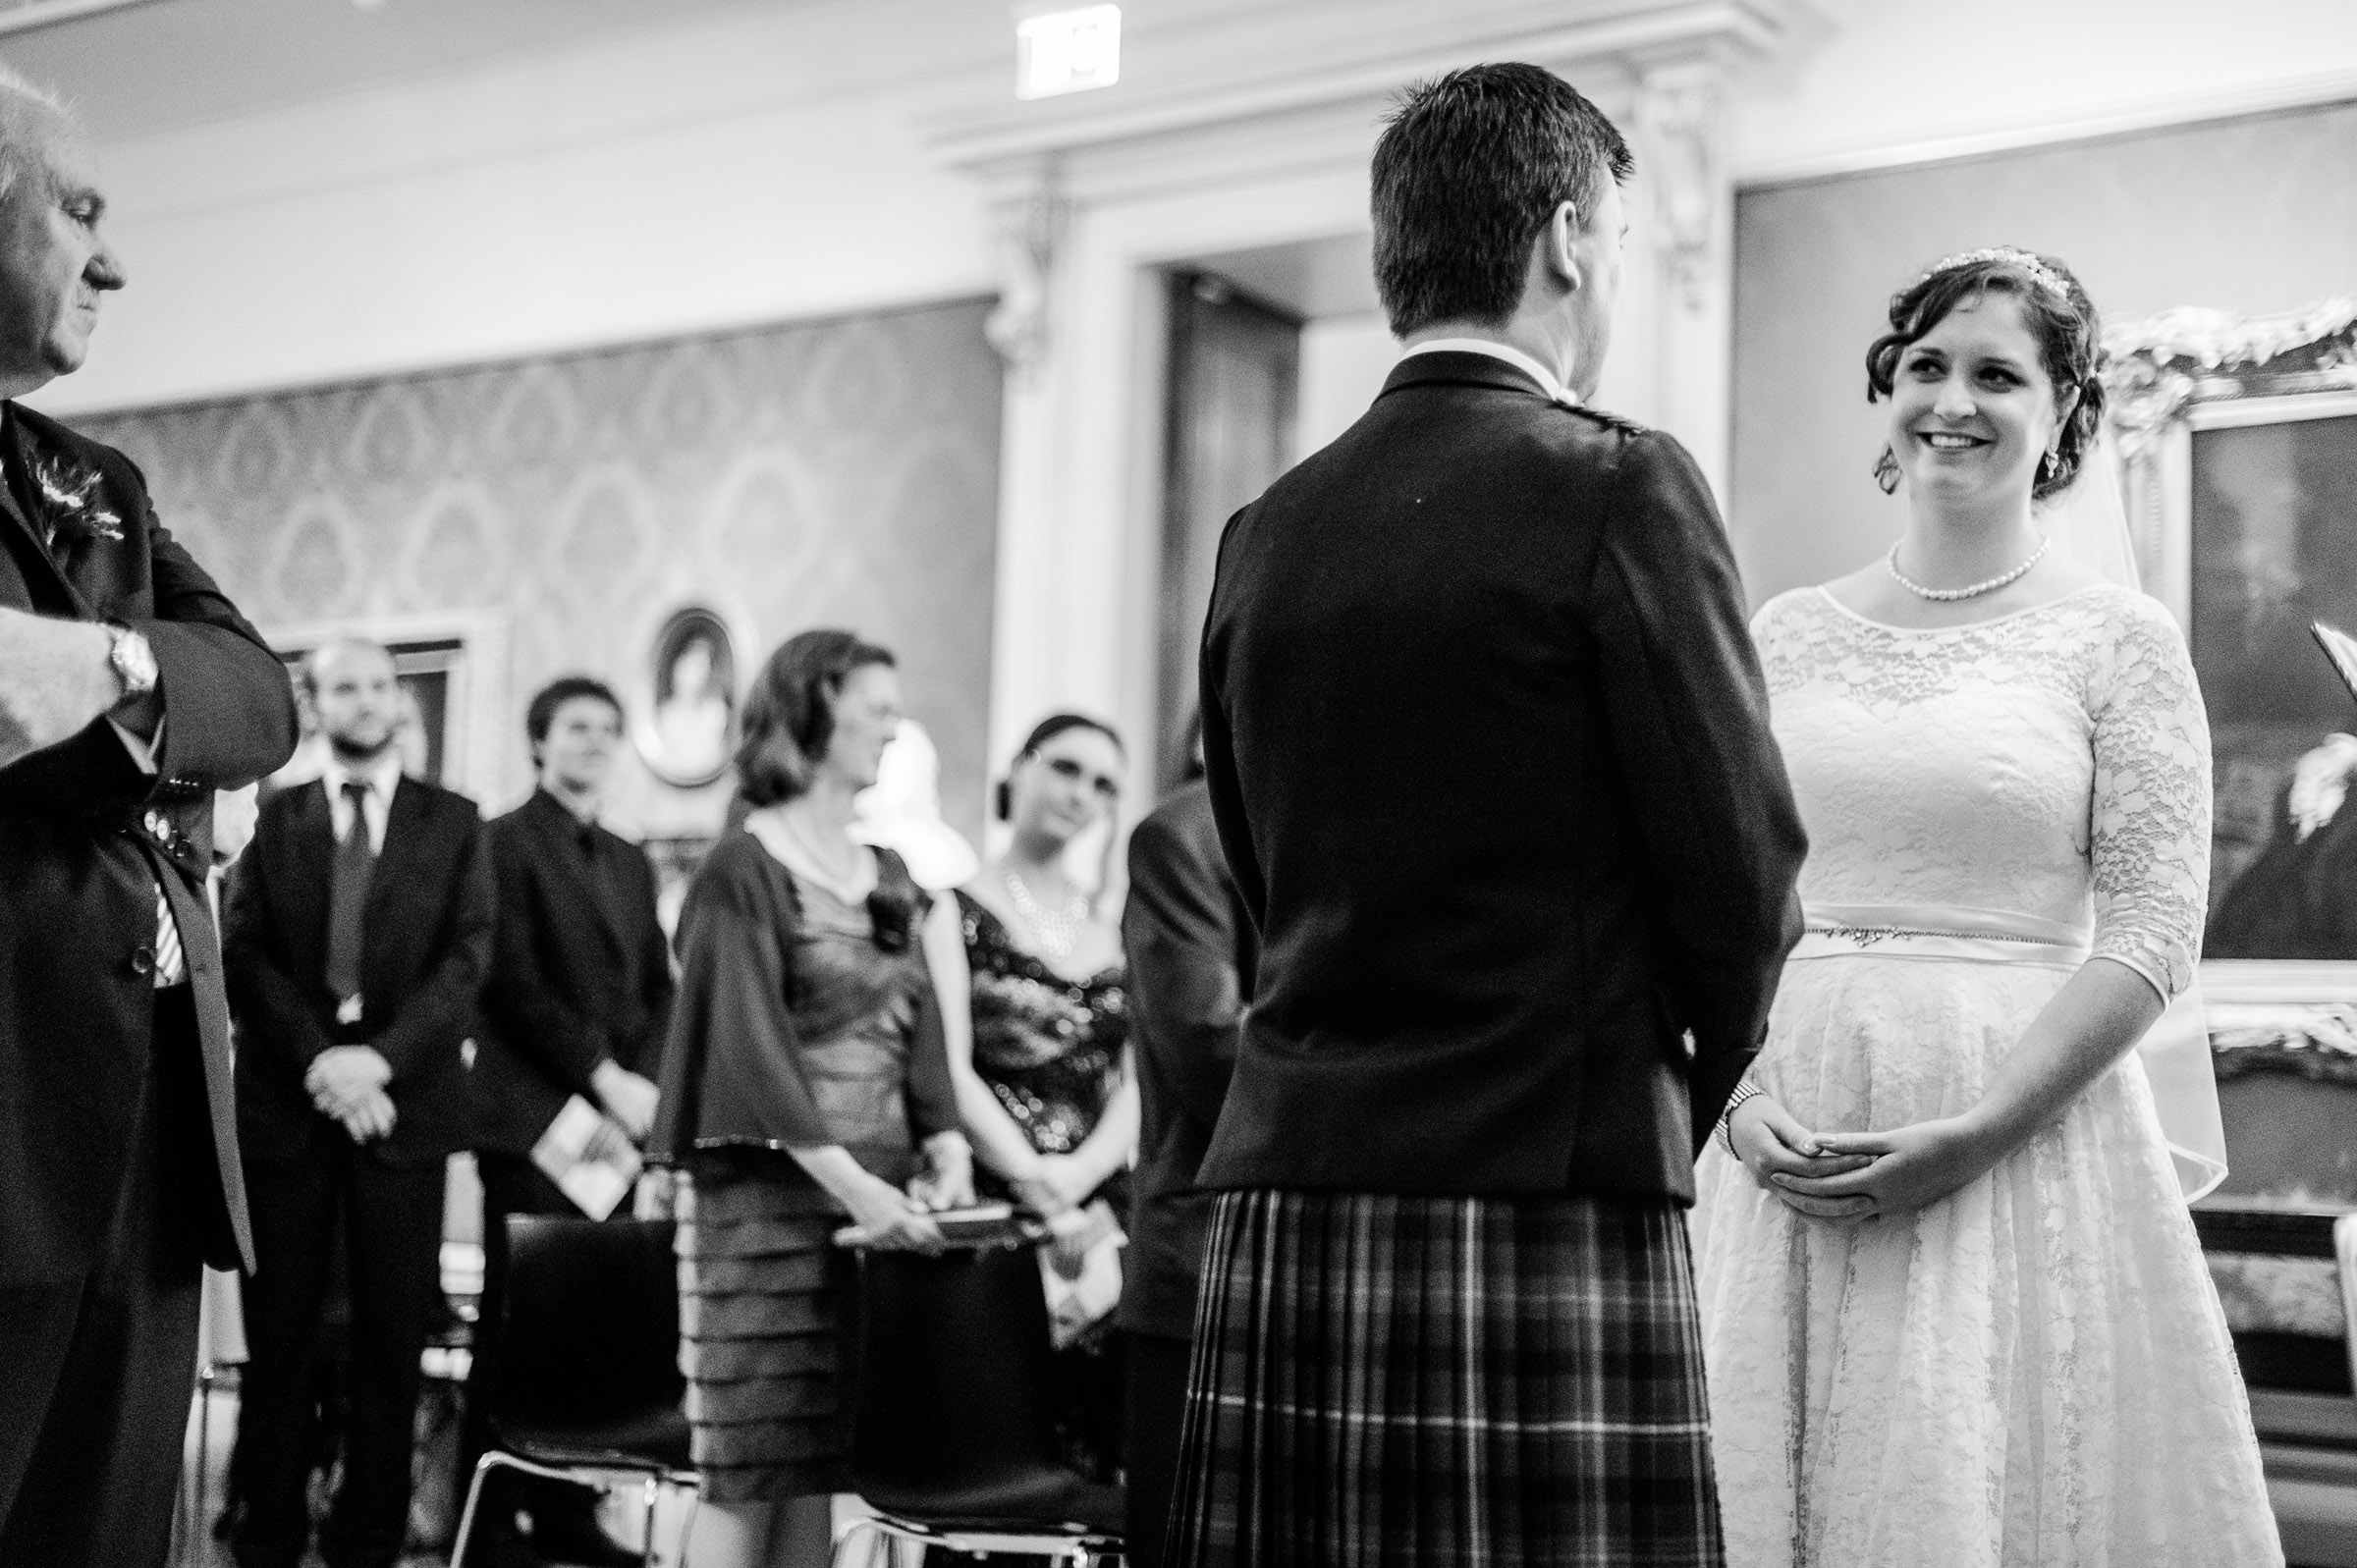 Ashmolean-Museum-Wedding-Pictures-0027.jpg